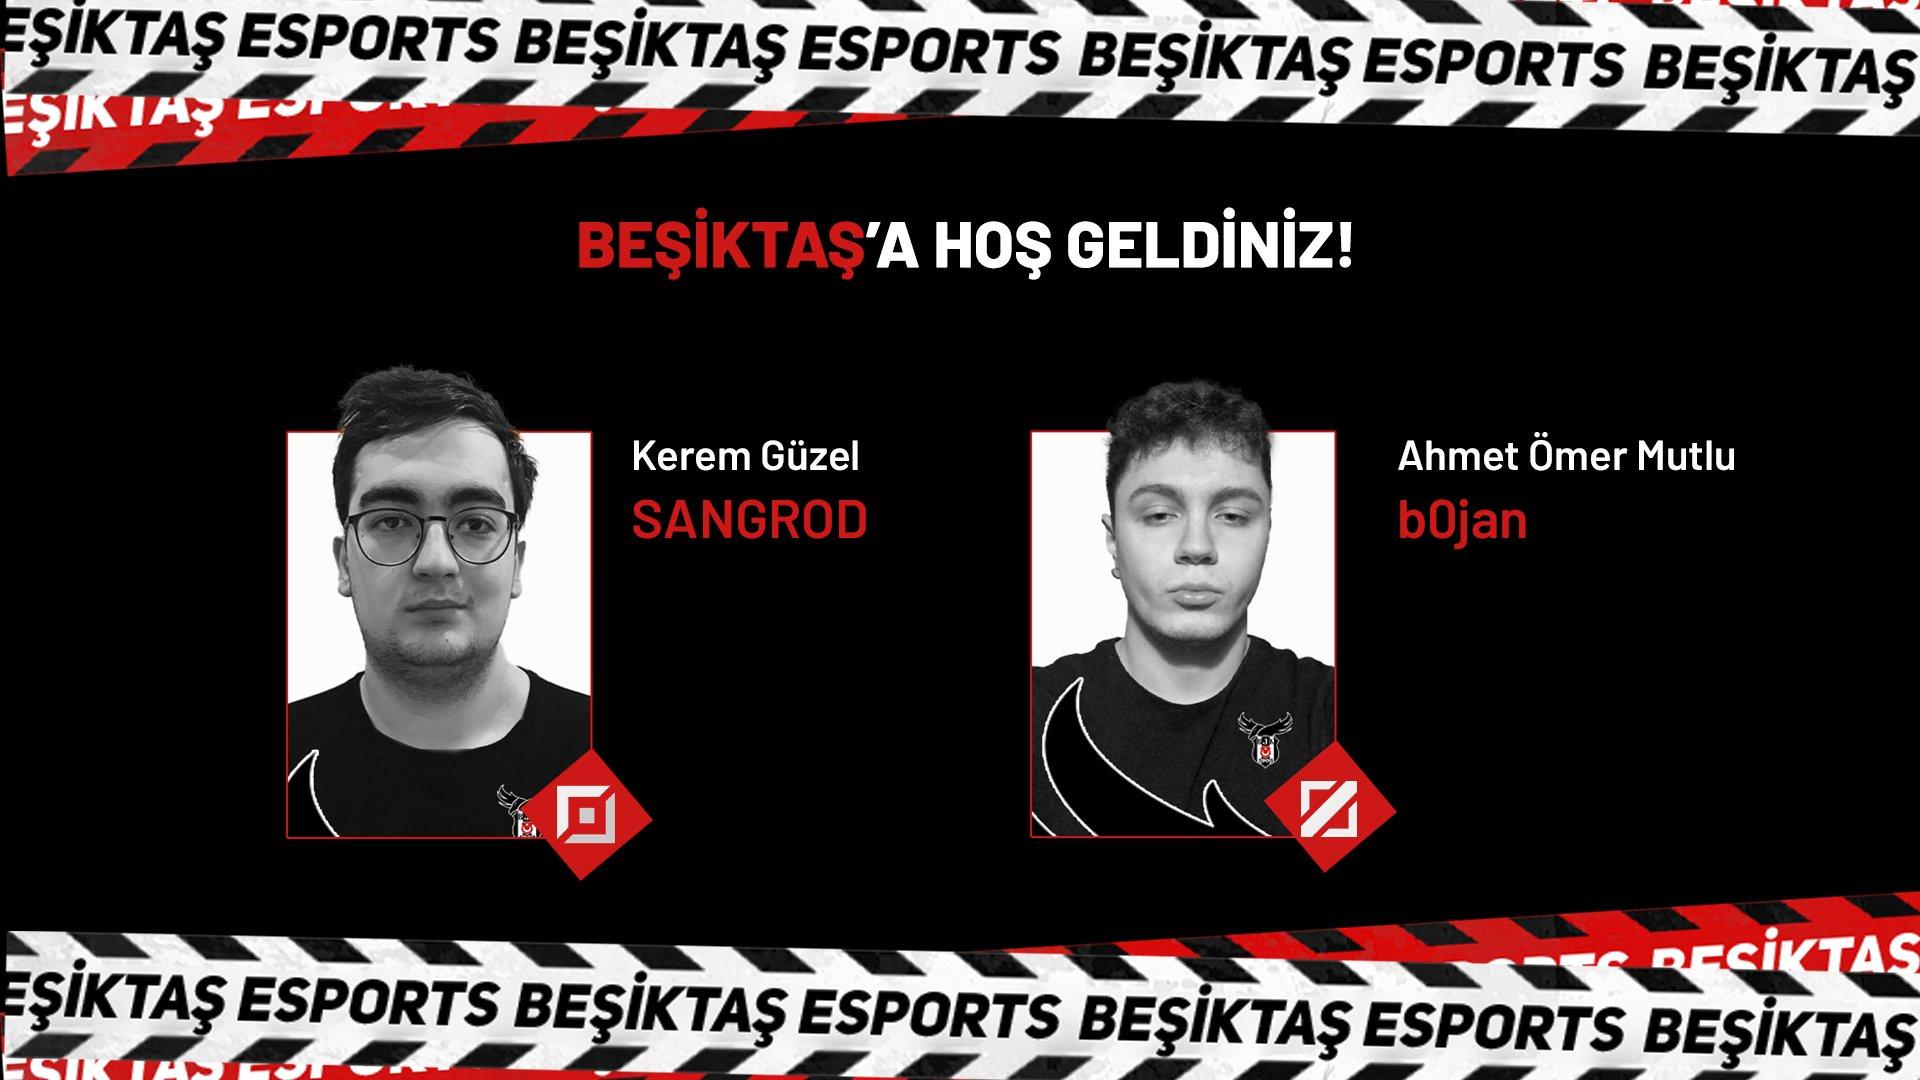 Beşiktaş Esports League of Legends Akademi